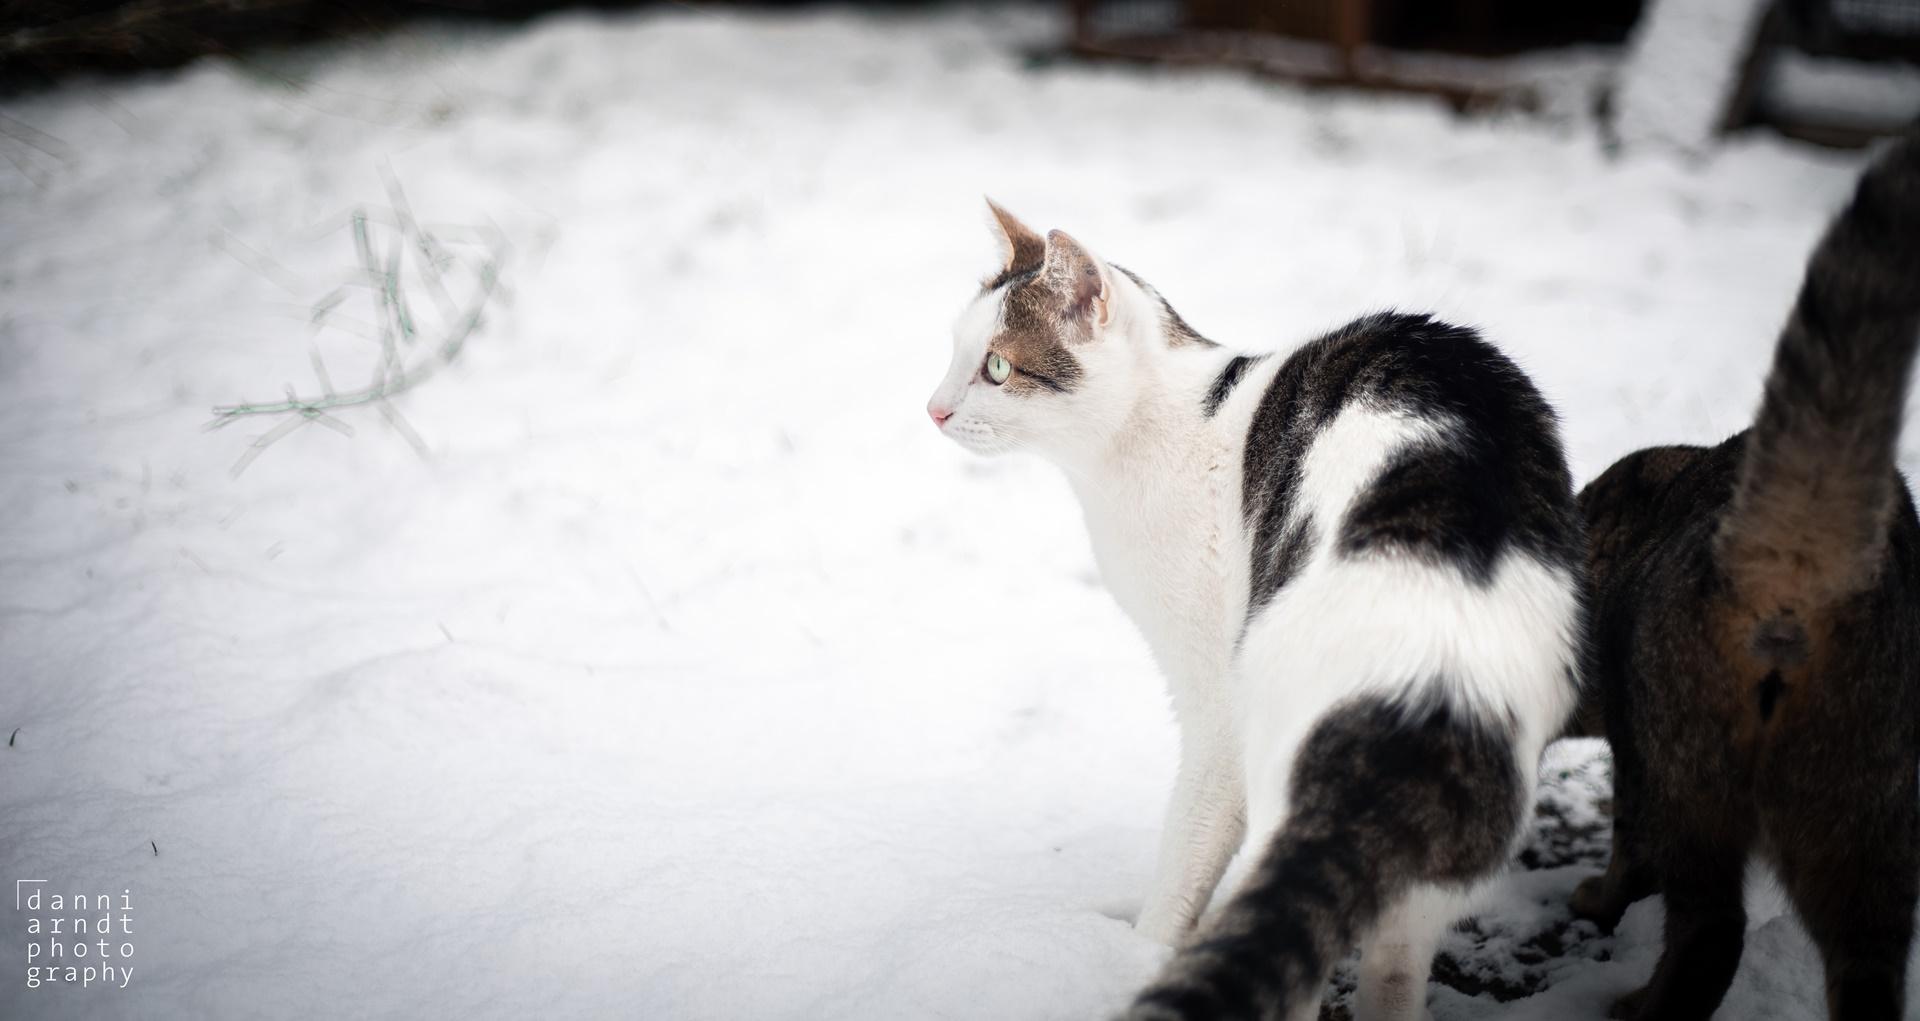 Tomcat snow